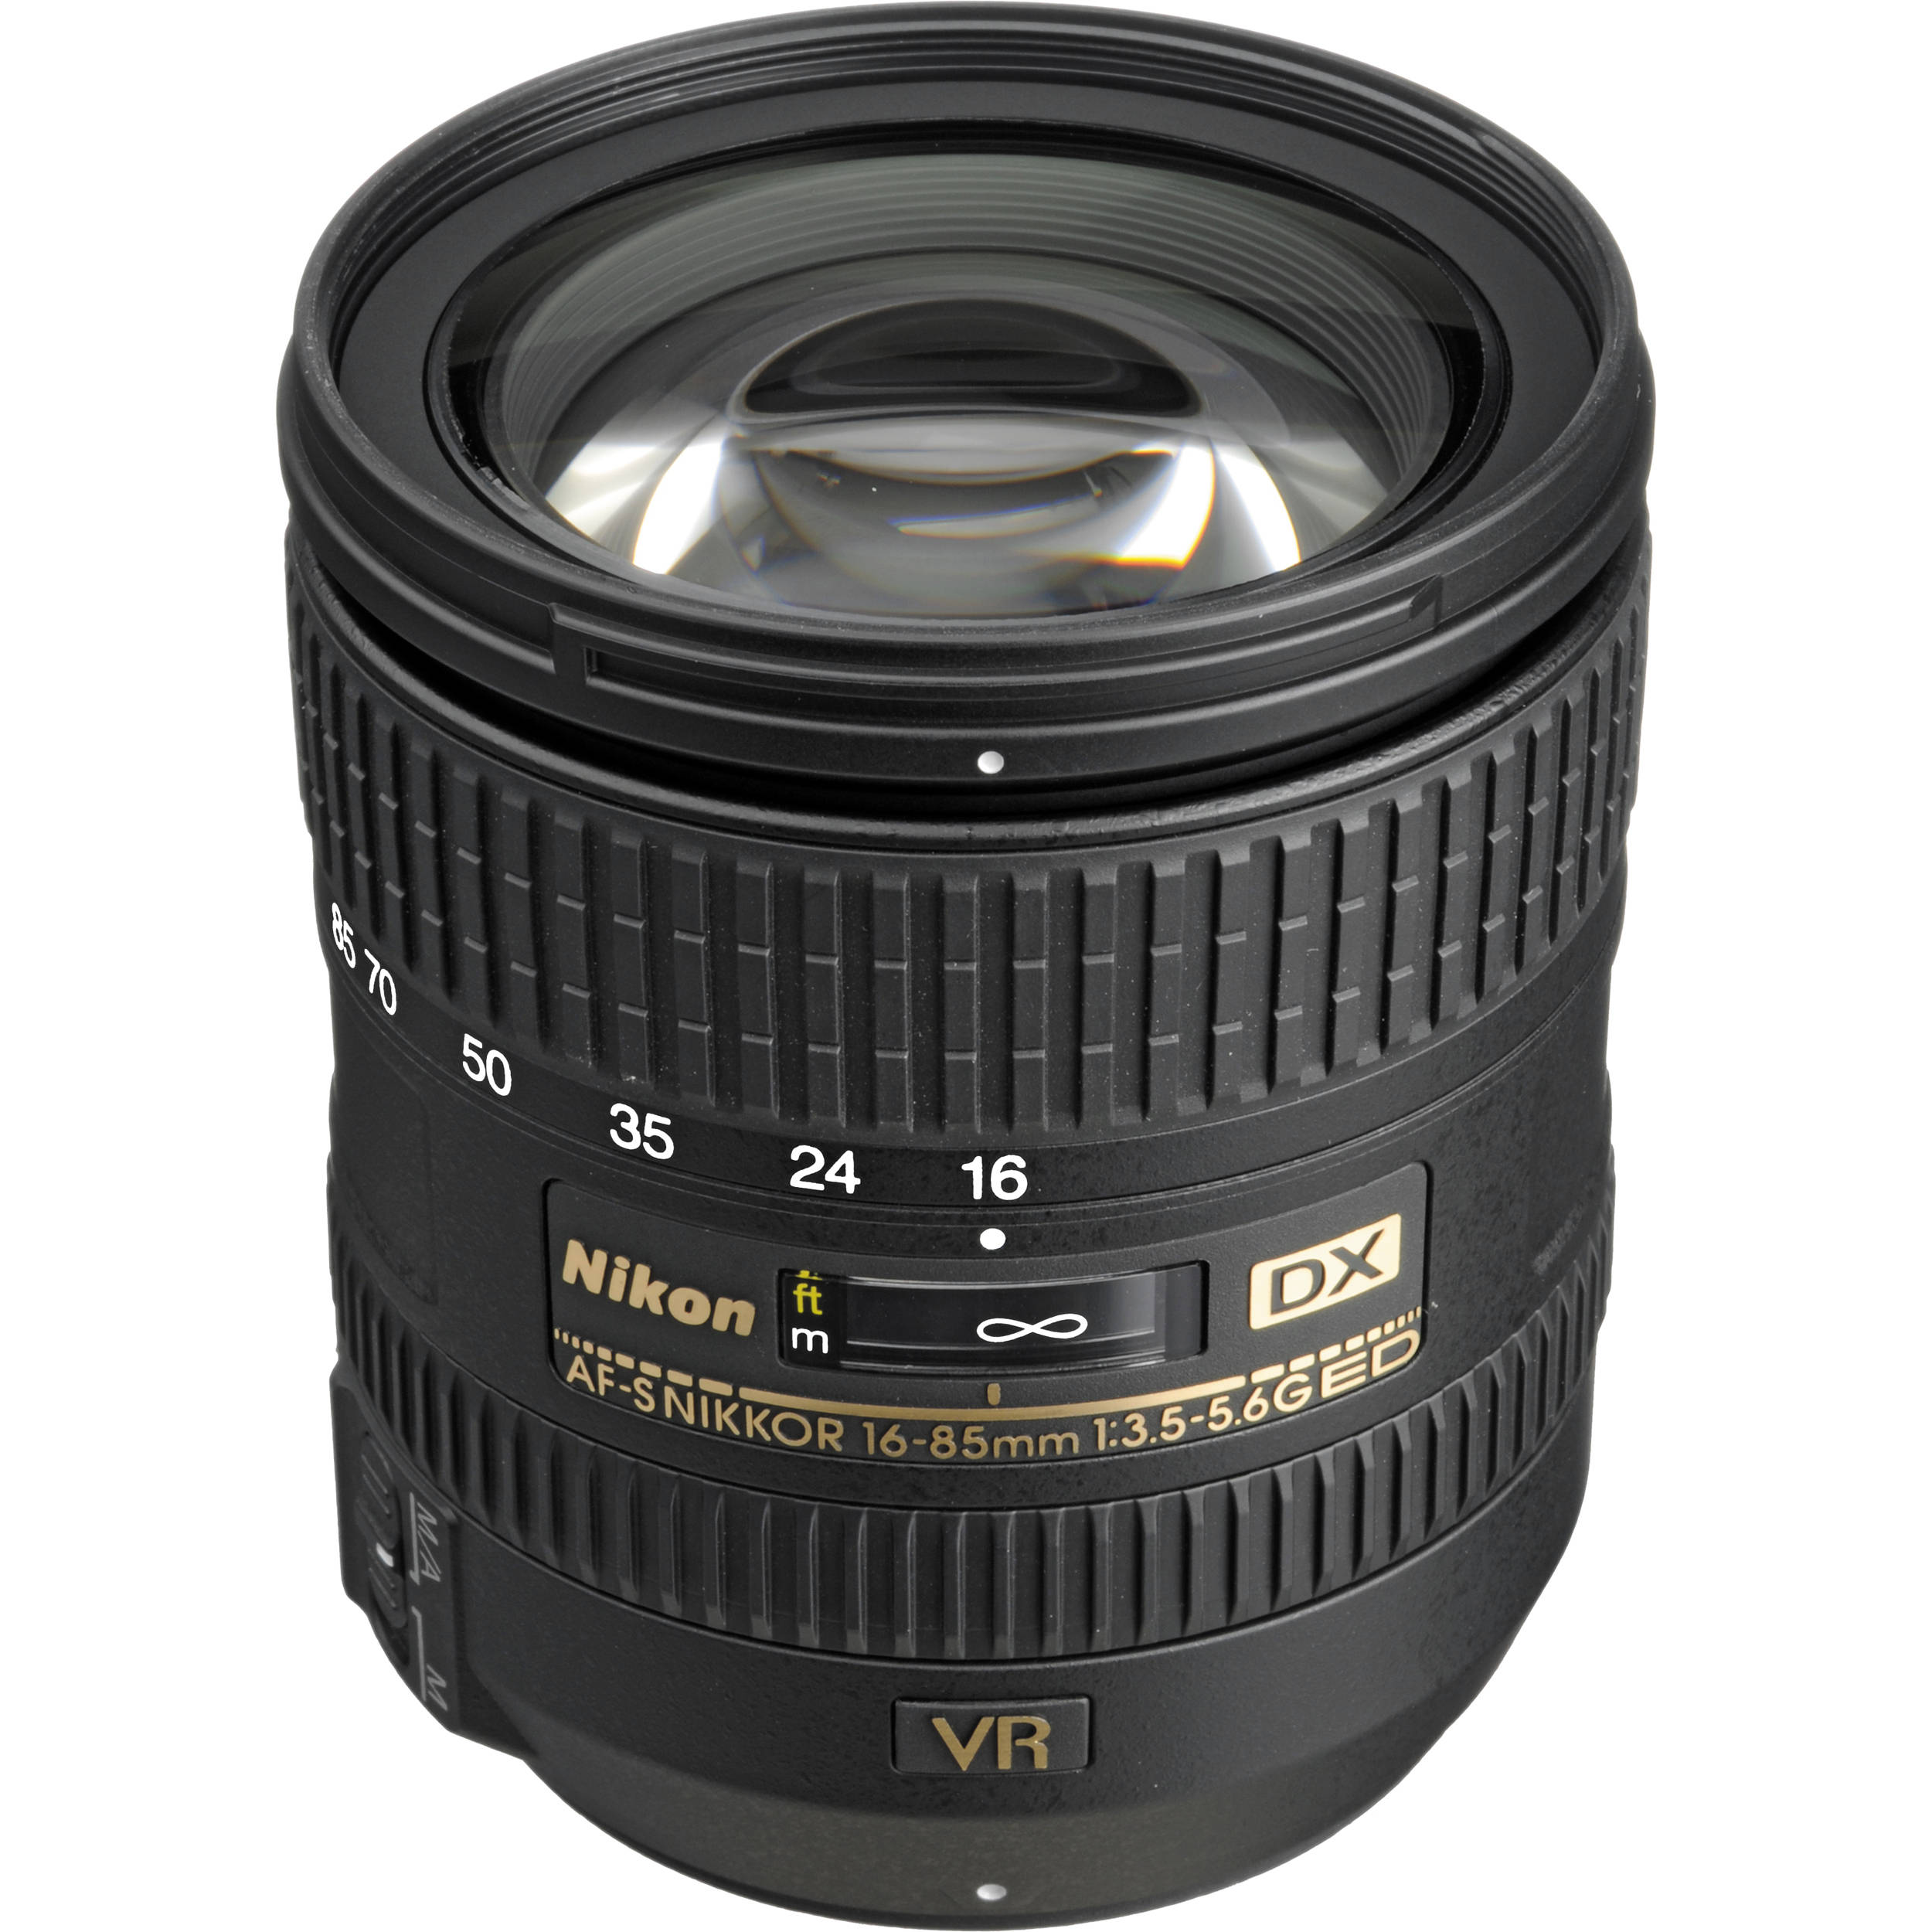 c product  USA Nikon mm f G ED VR